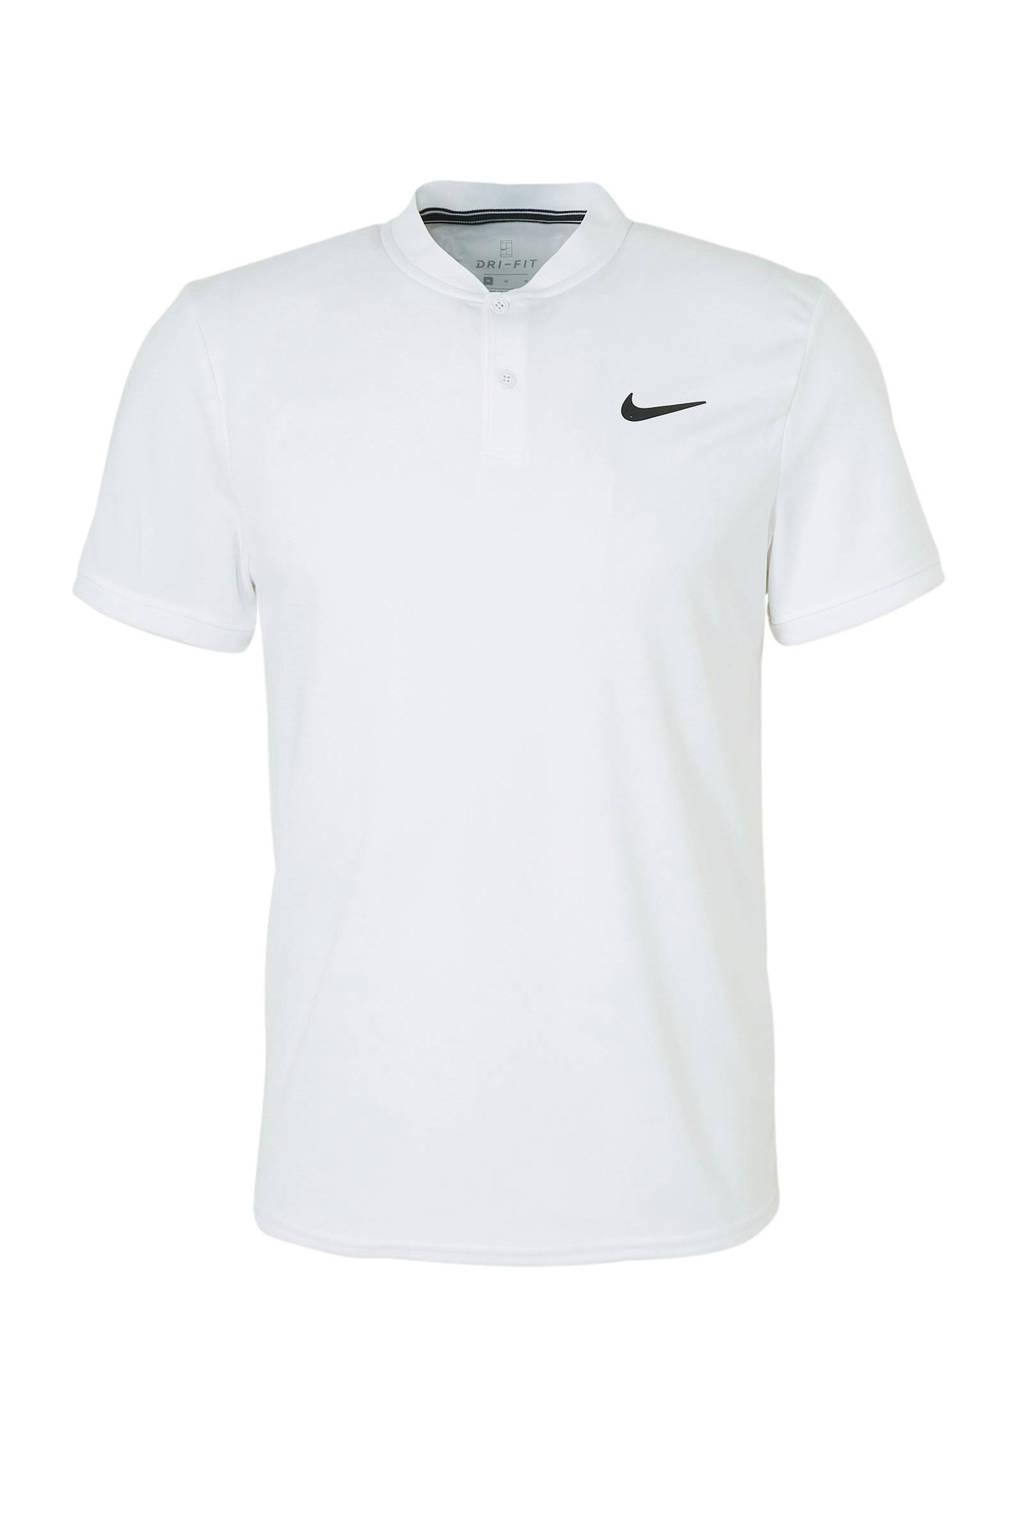 Nike   sportpolo wit, Wit